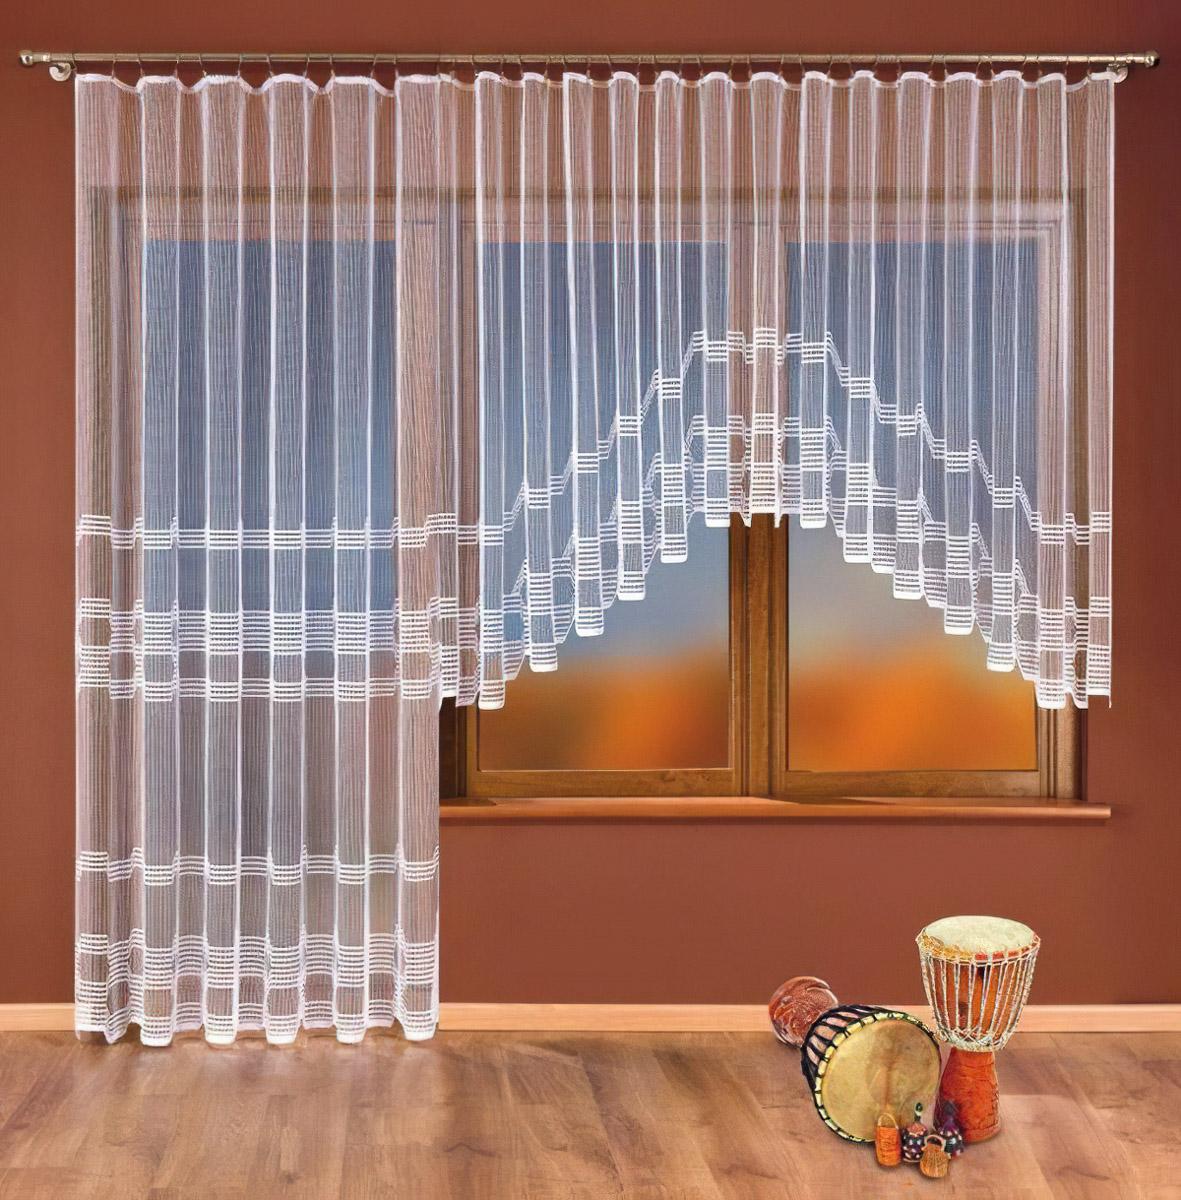 Forbyt kusová záclona IVONA jednobarevná bílá, výška 160 cm x šířka 400 cm (na okno)